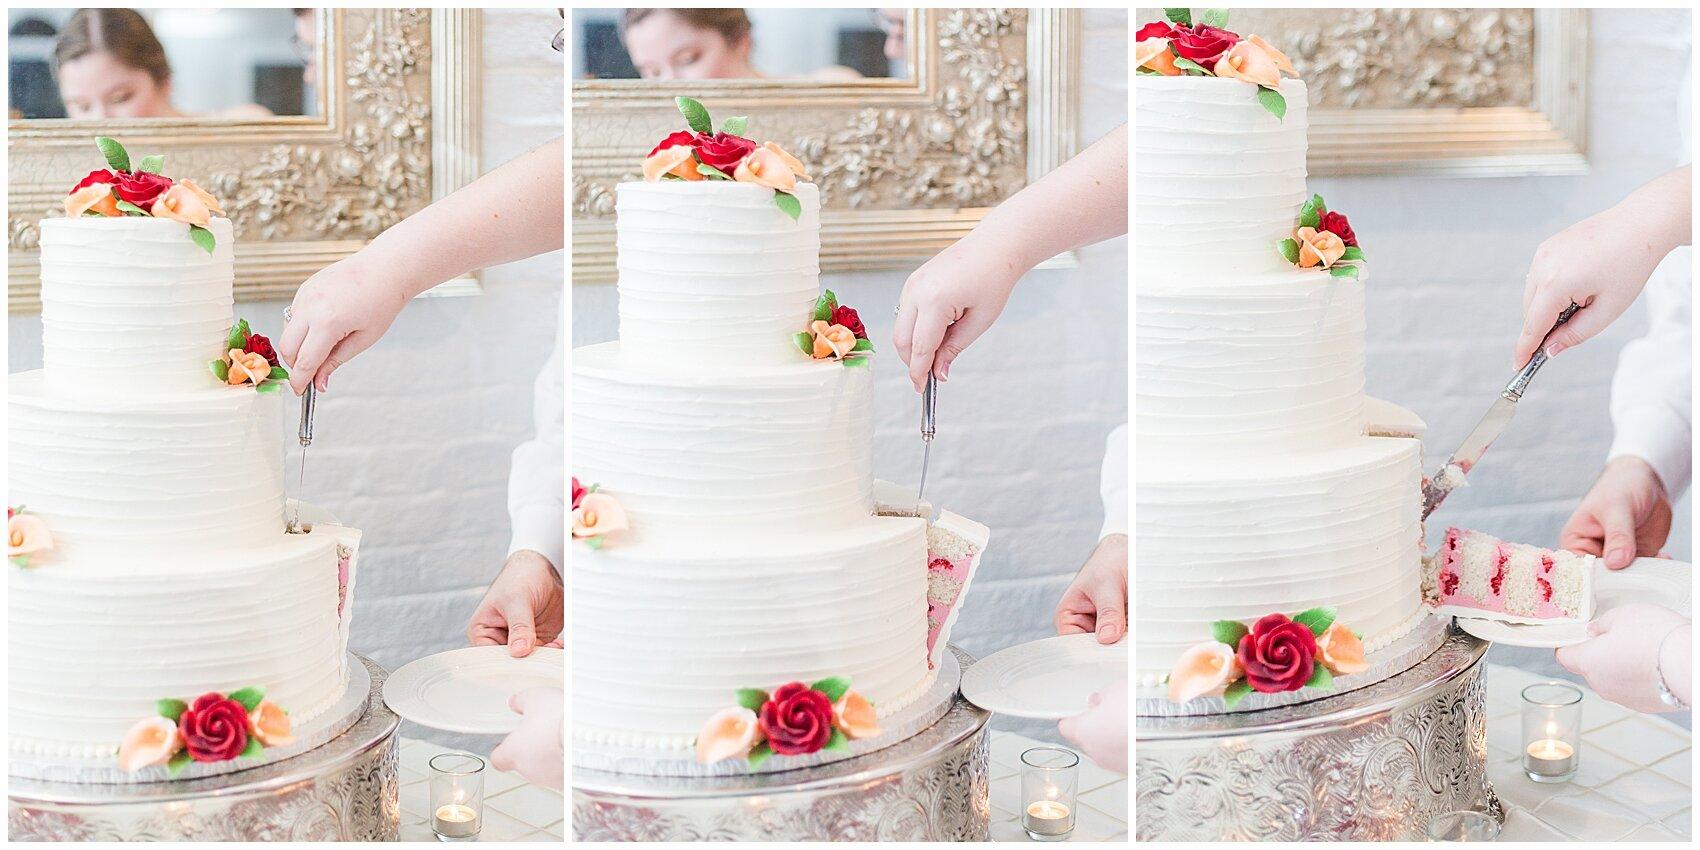 HOW-TO-CUT-A-WEDDING-CAKE_0004.jpg